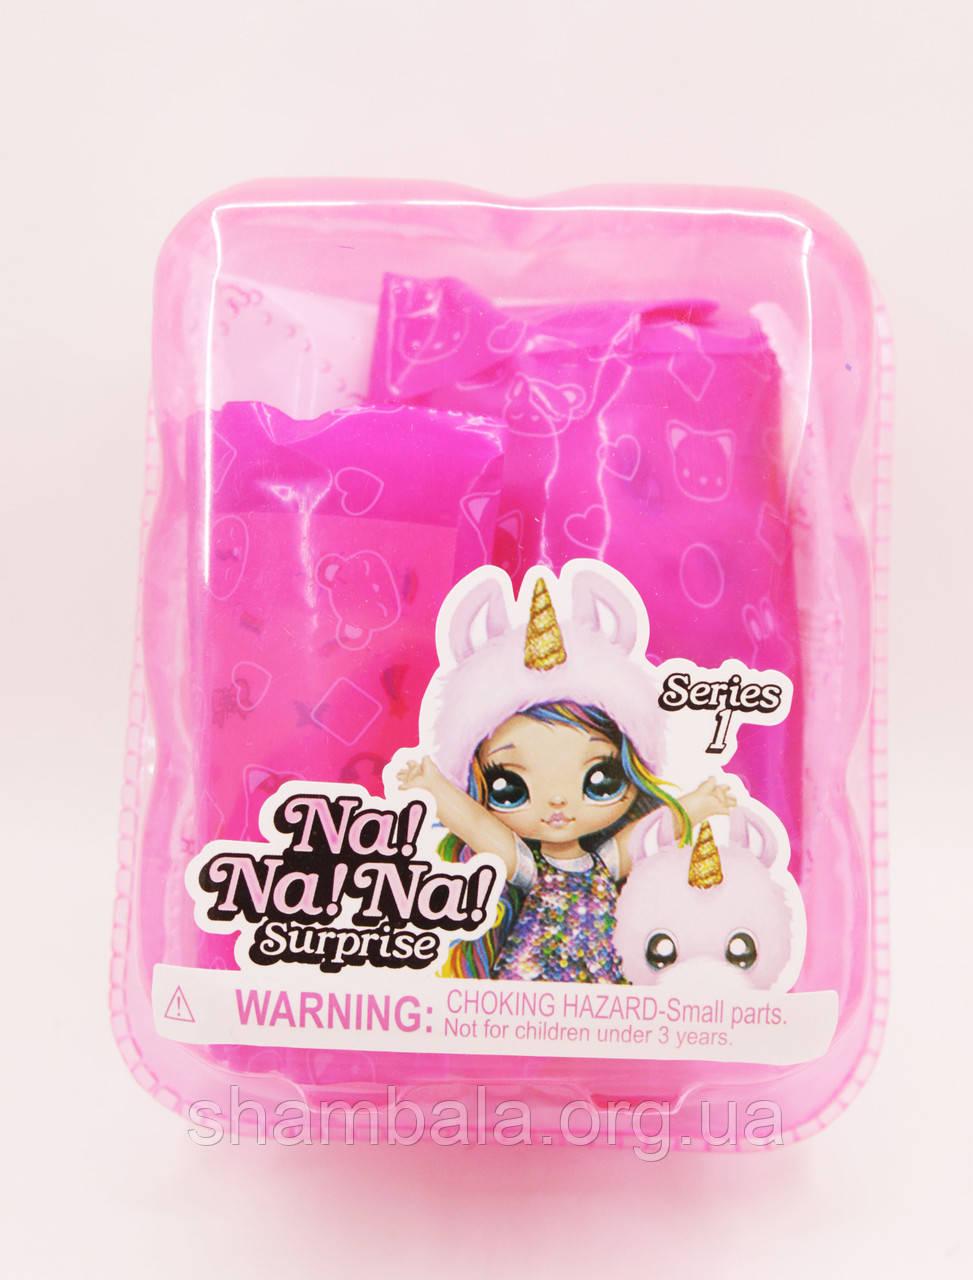 Кукла Na! Na! Na! Surprise серия 1